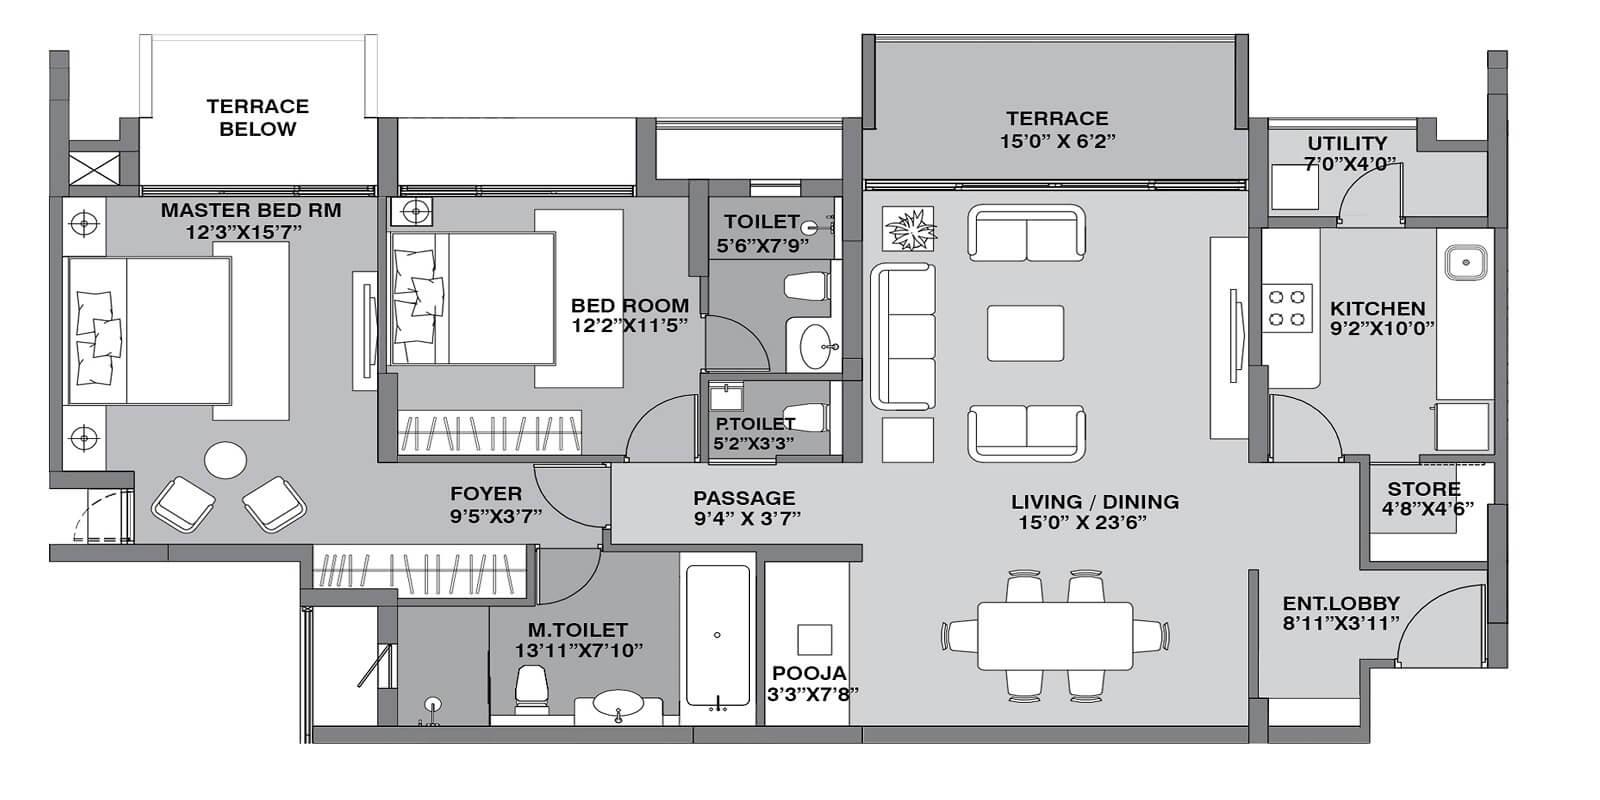 lodha belmondo apartment 2bhk 1298sqft 1